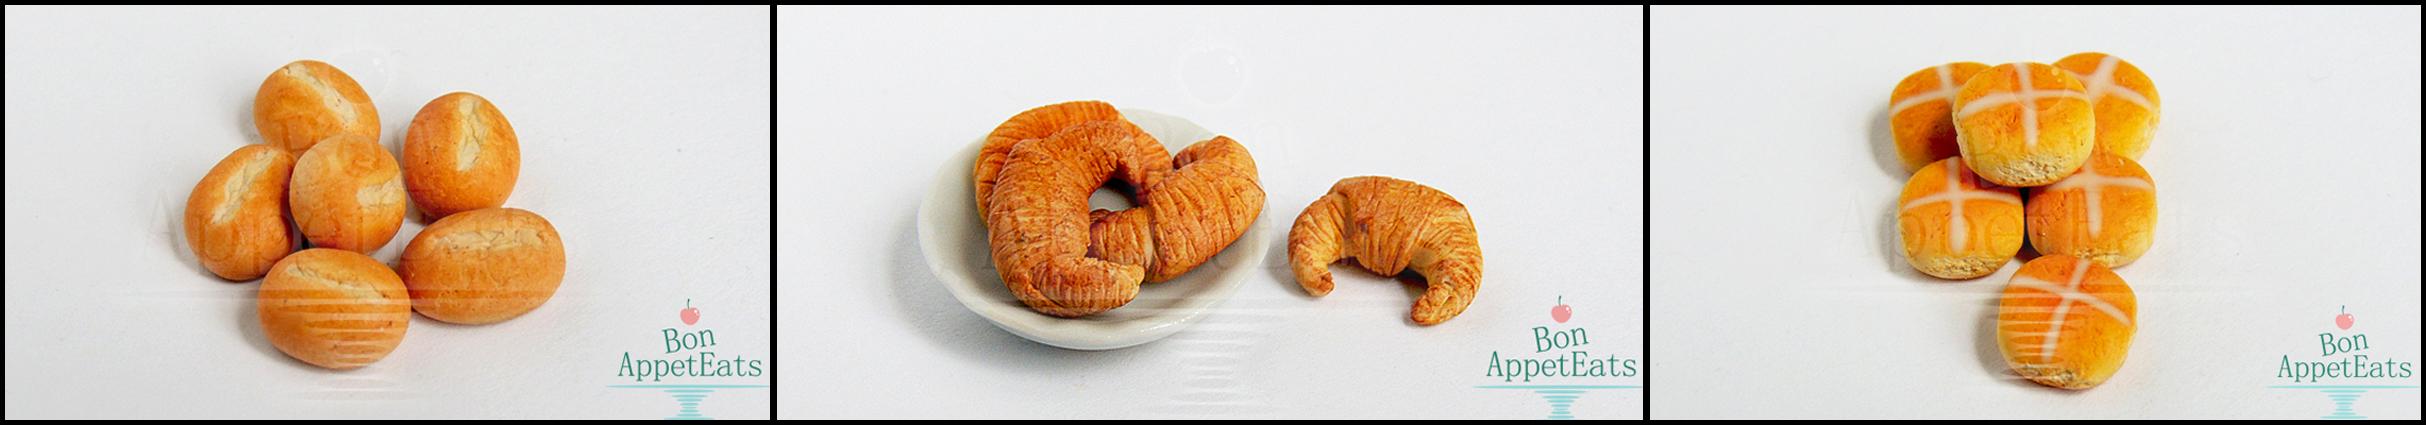 1:12 Scale Rolls, Croissants, and Hot Cross Buns by Bon-AppetEats